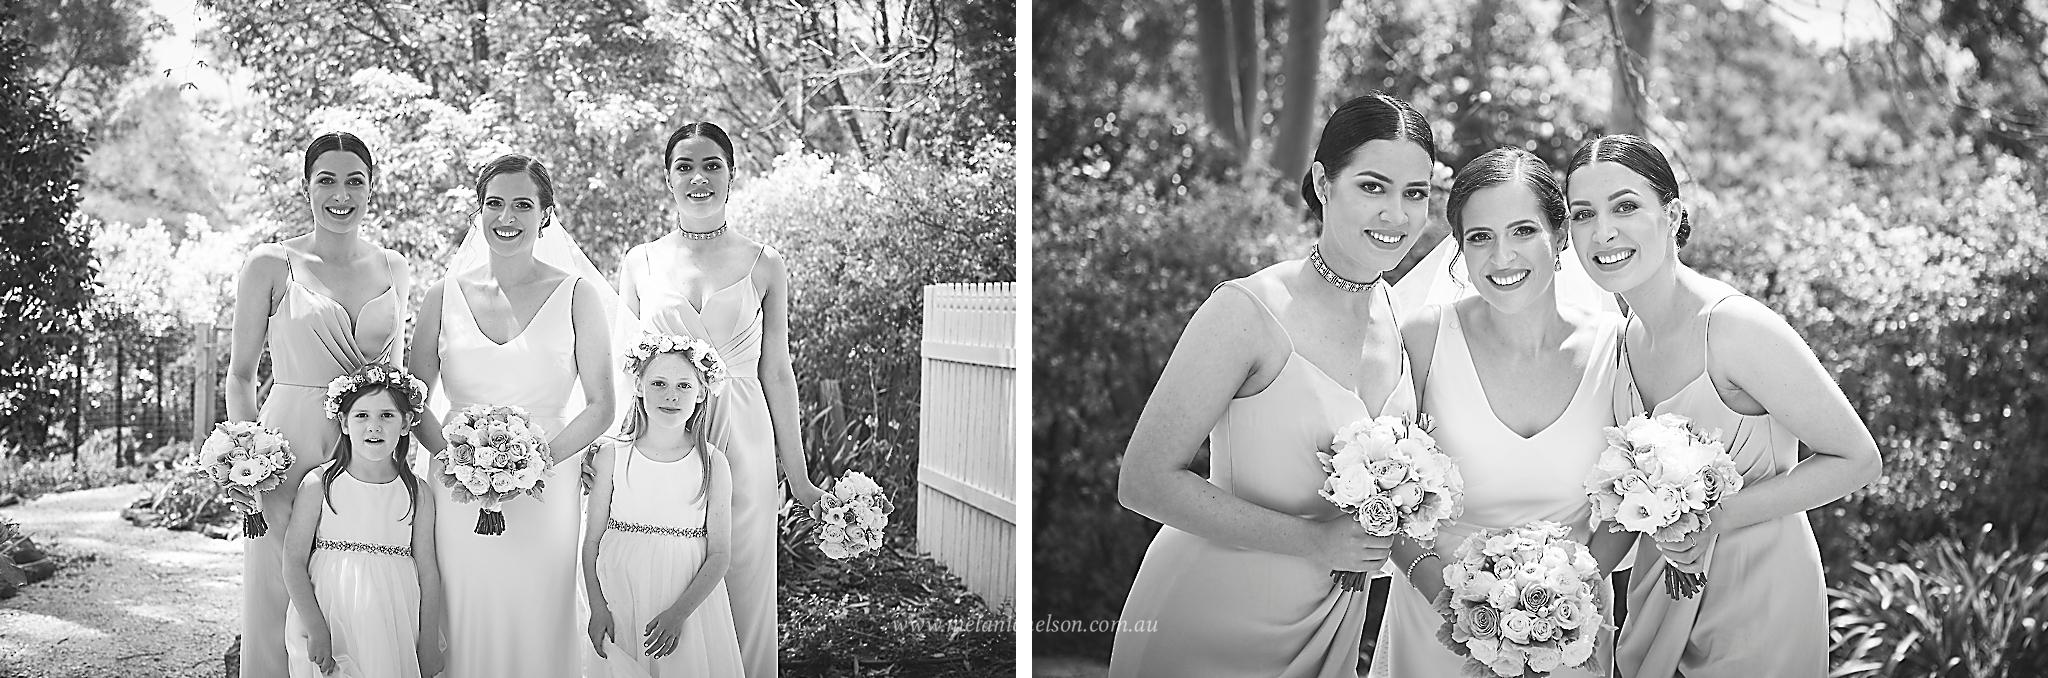 mount_lofty_wedding_0024.jpg